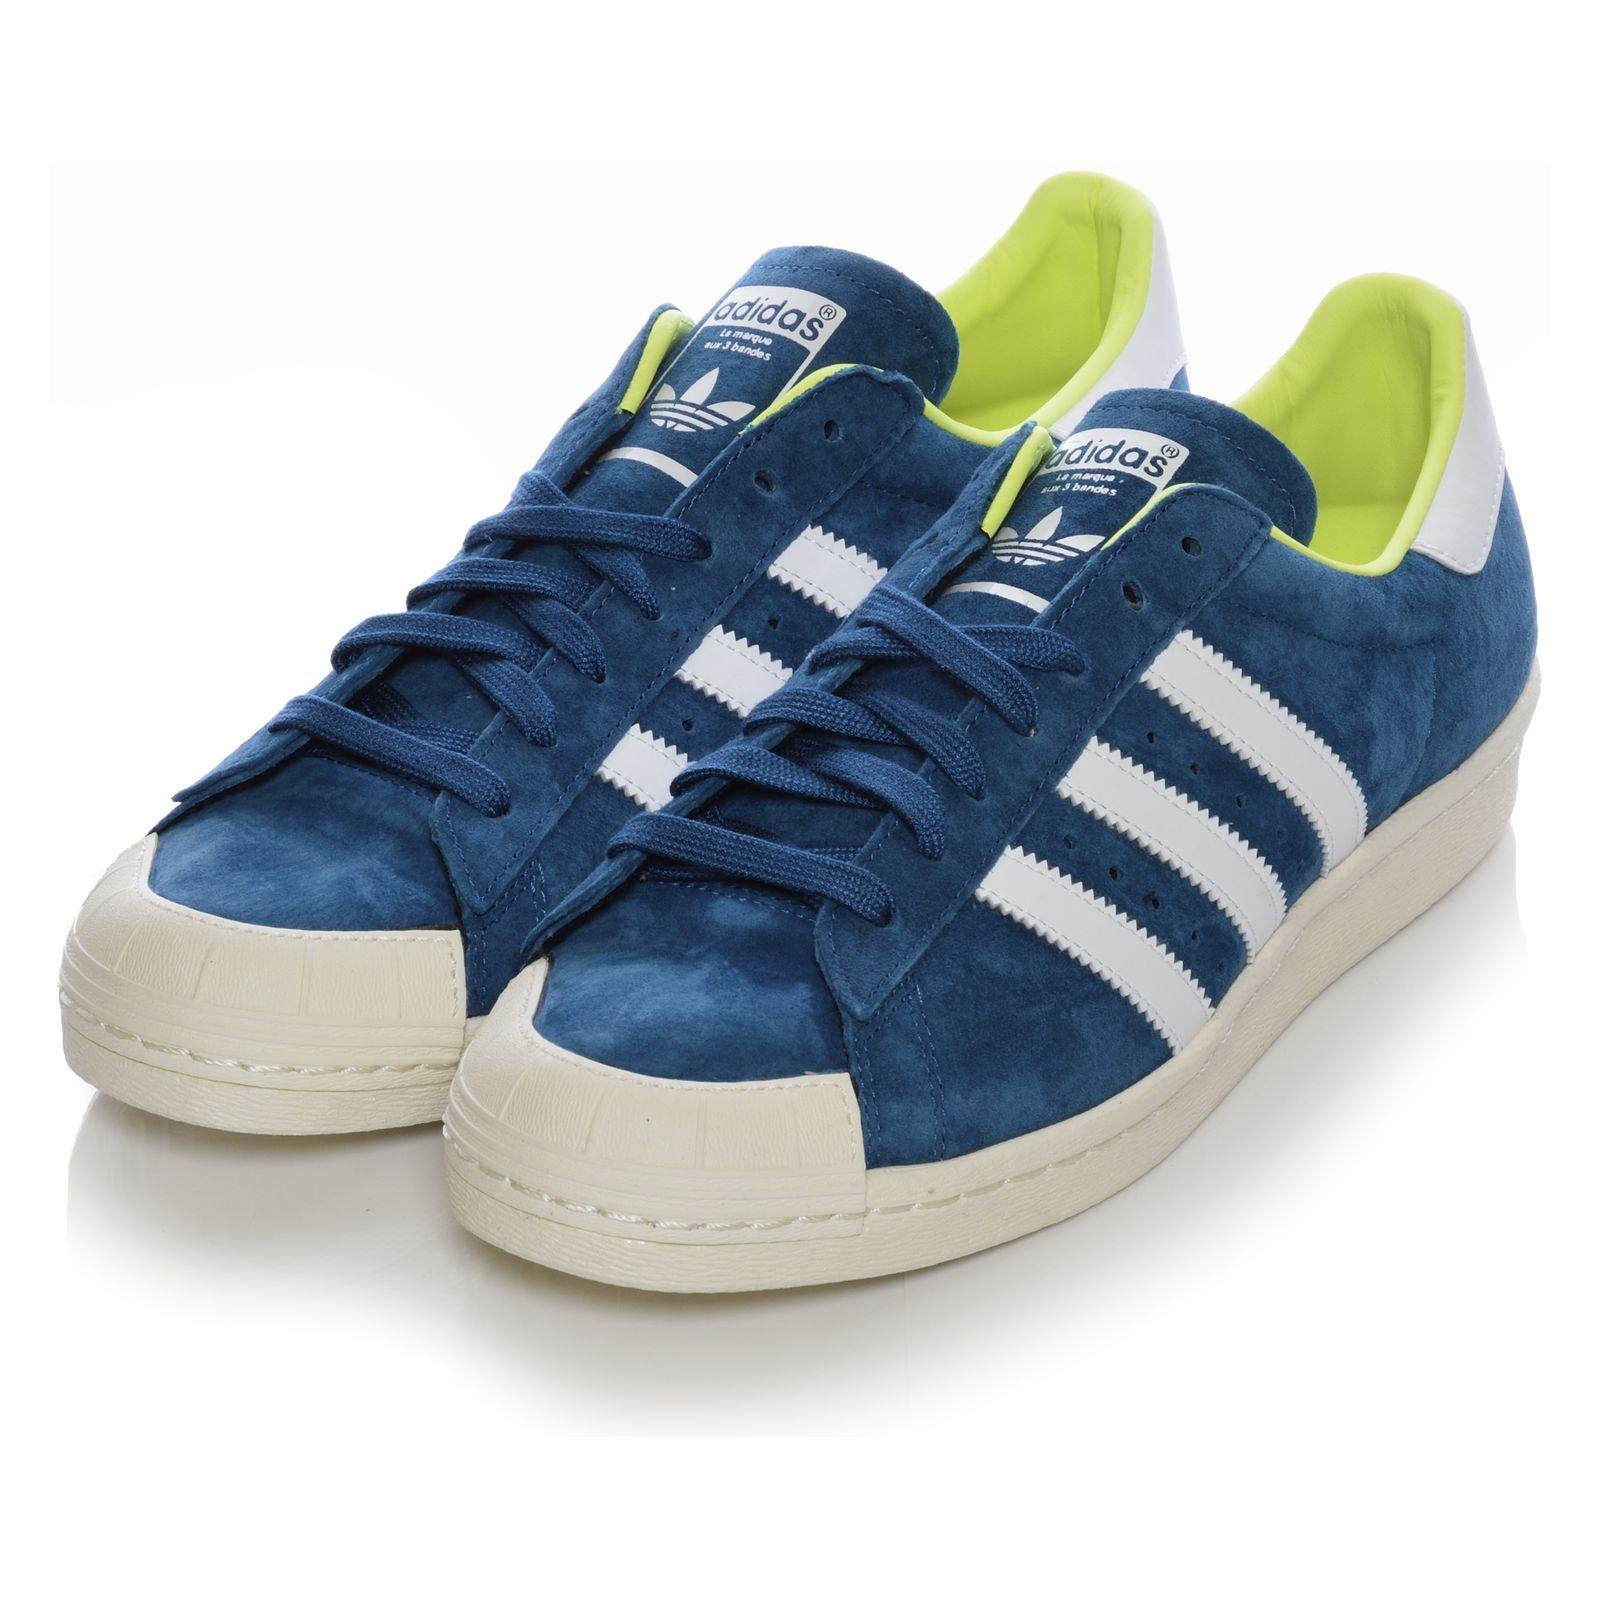 adidas originals superstar 80s halfshell shoes leather sneakers blue 38 2 3 ebay. Black Bedroom Furniture Sets. Home Design Ideas